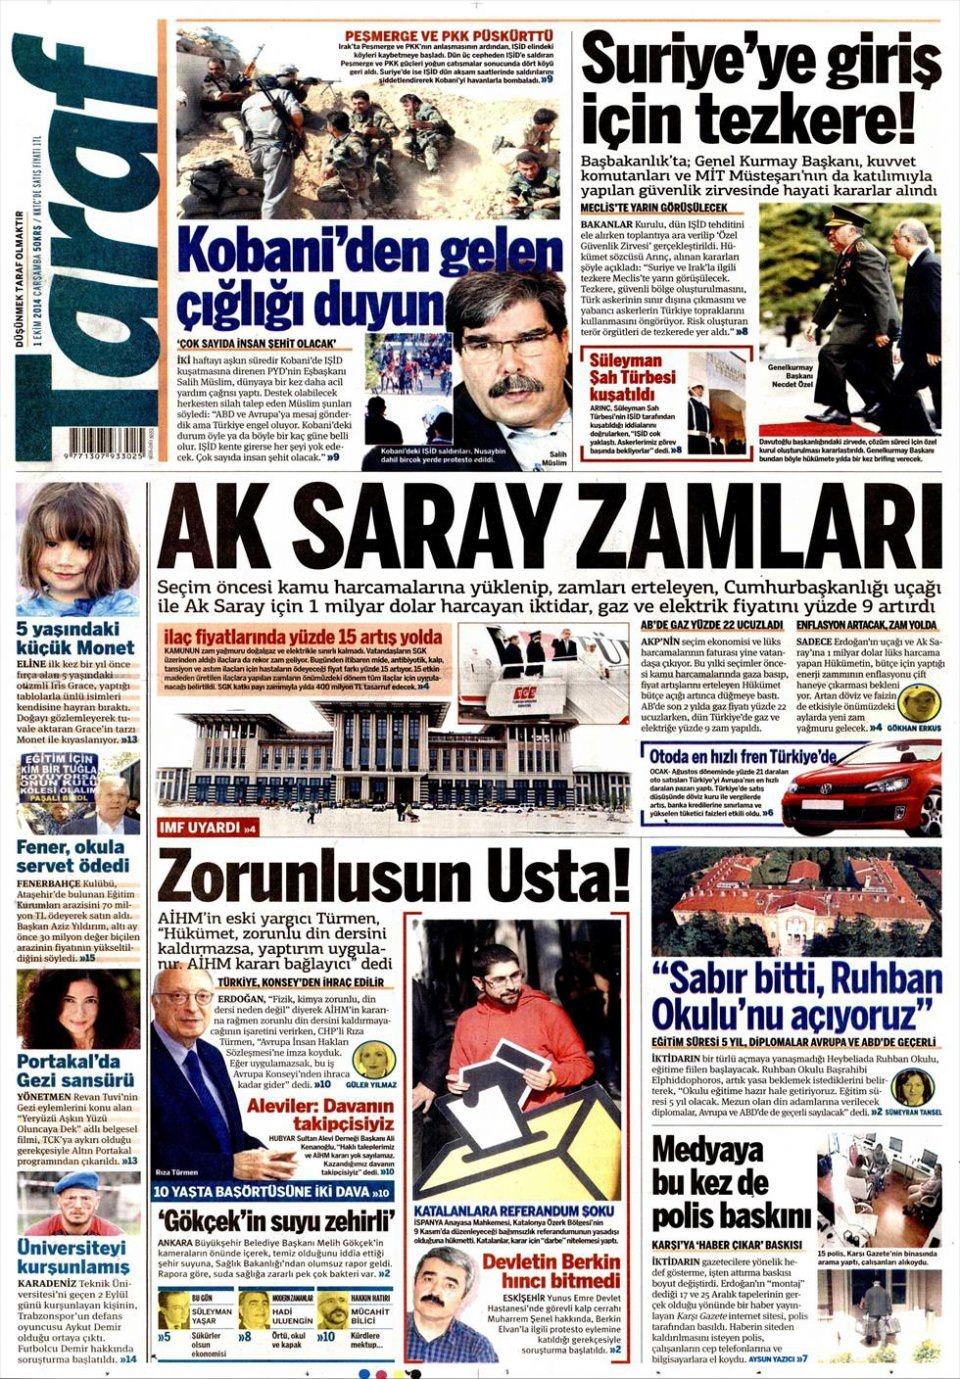 1 Ekim 2014 gazete manşetleri 19